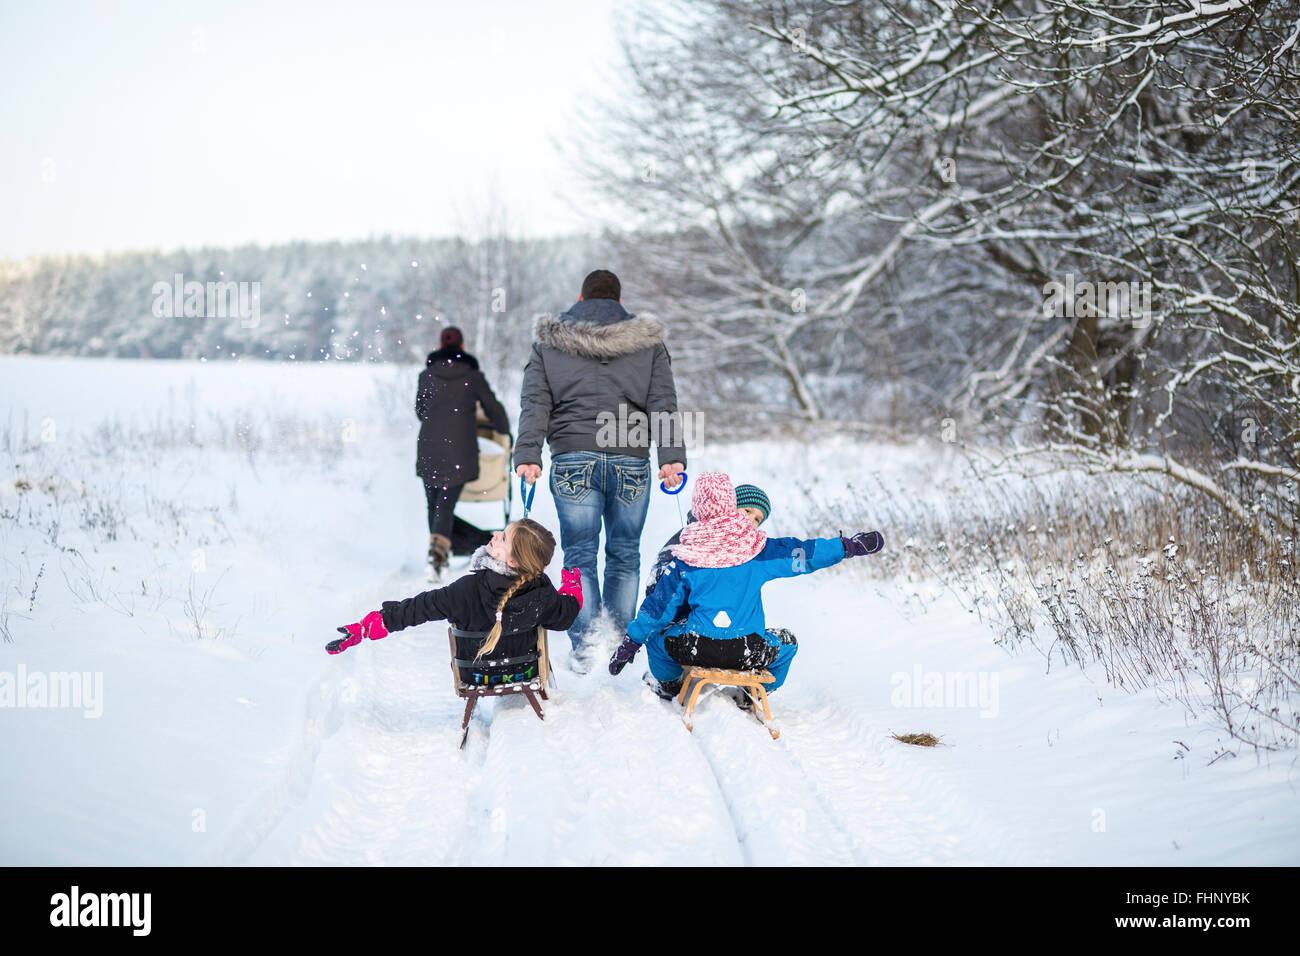 Germany, Brandenburg, back view of familiy with three children tobogganing - Stock Image